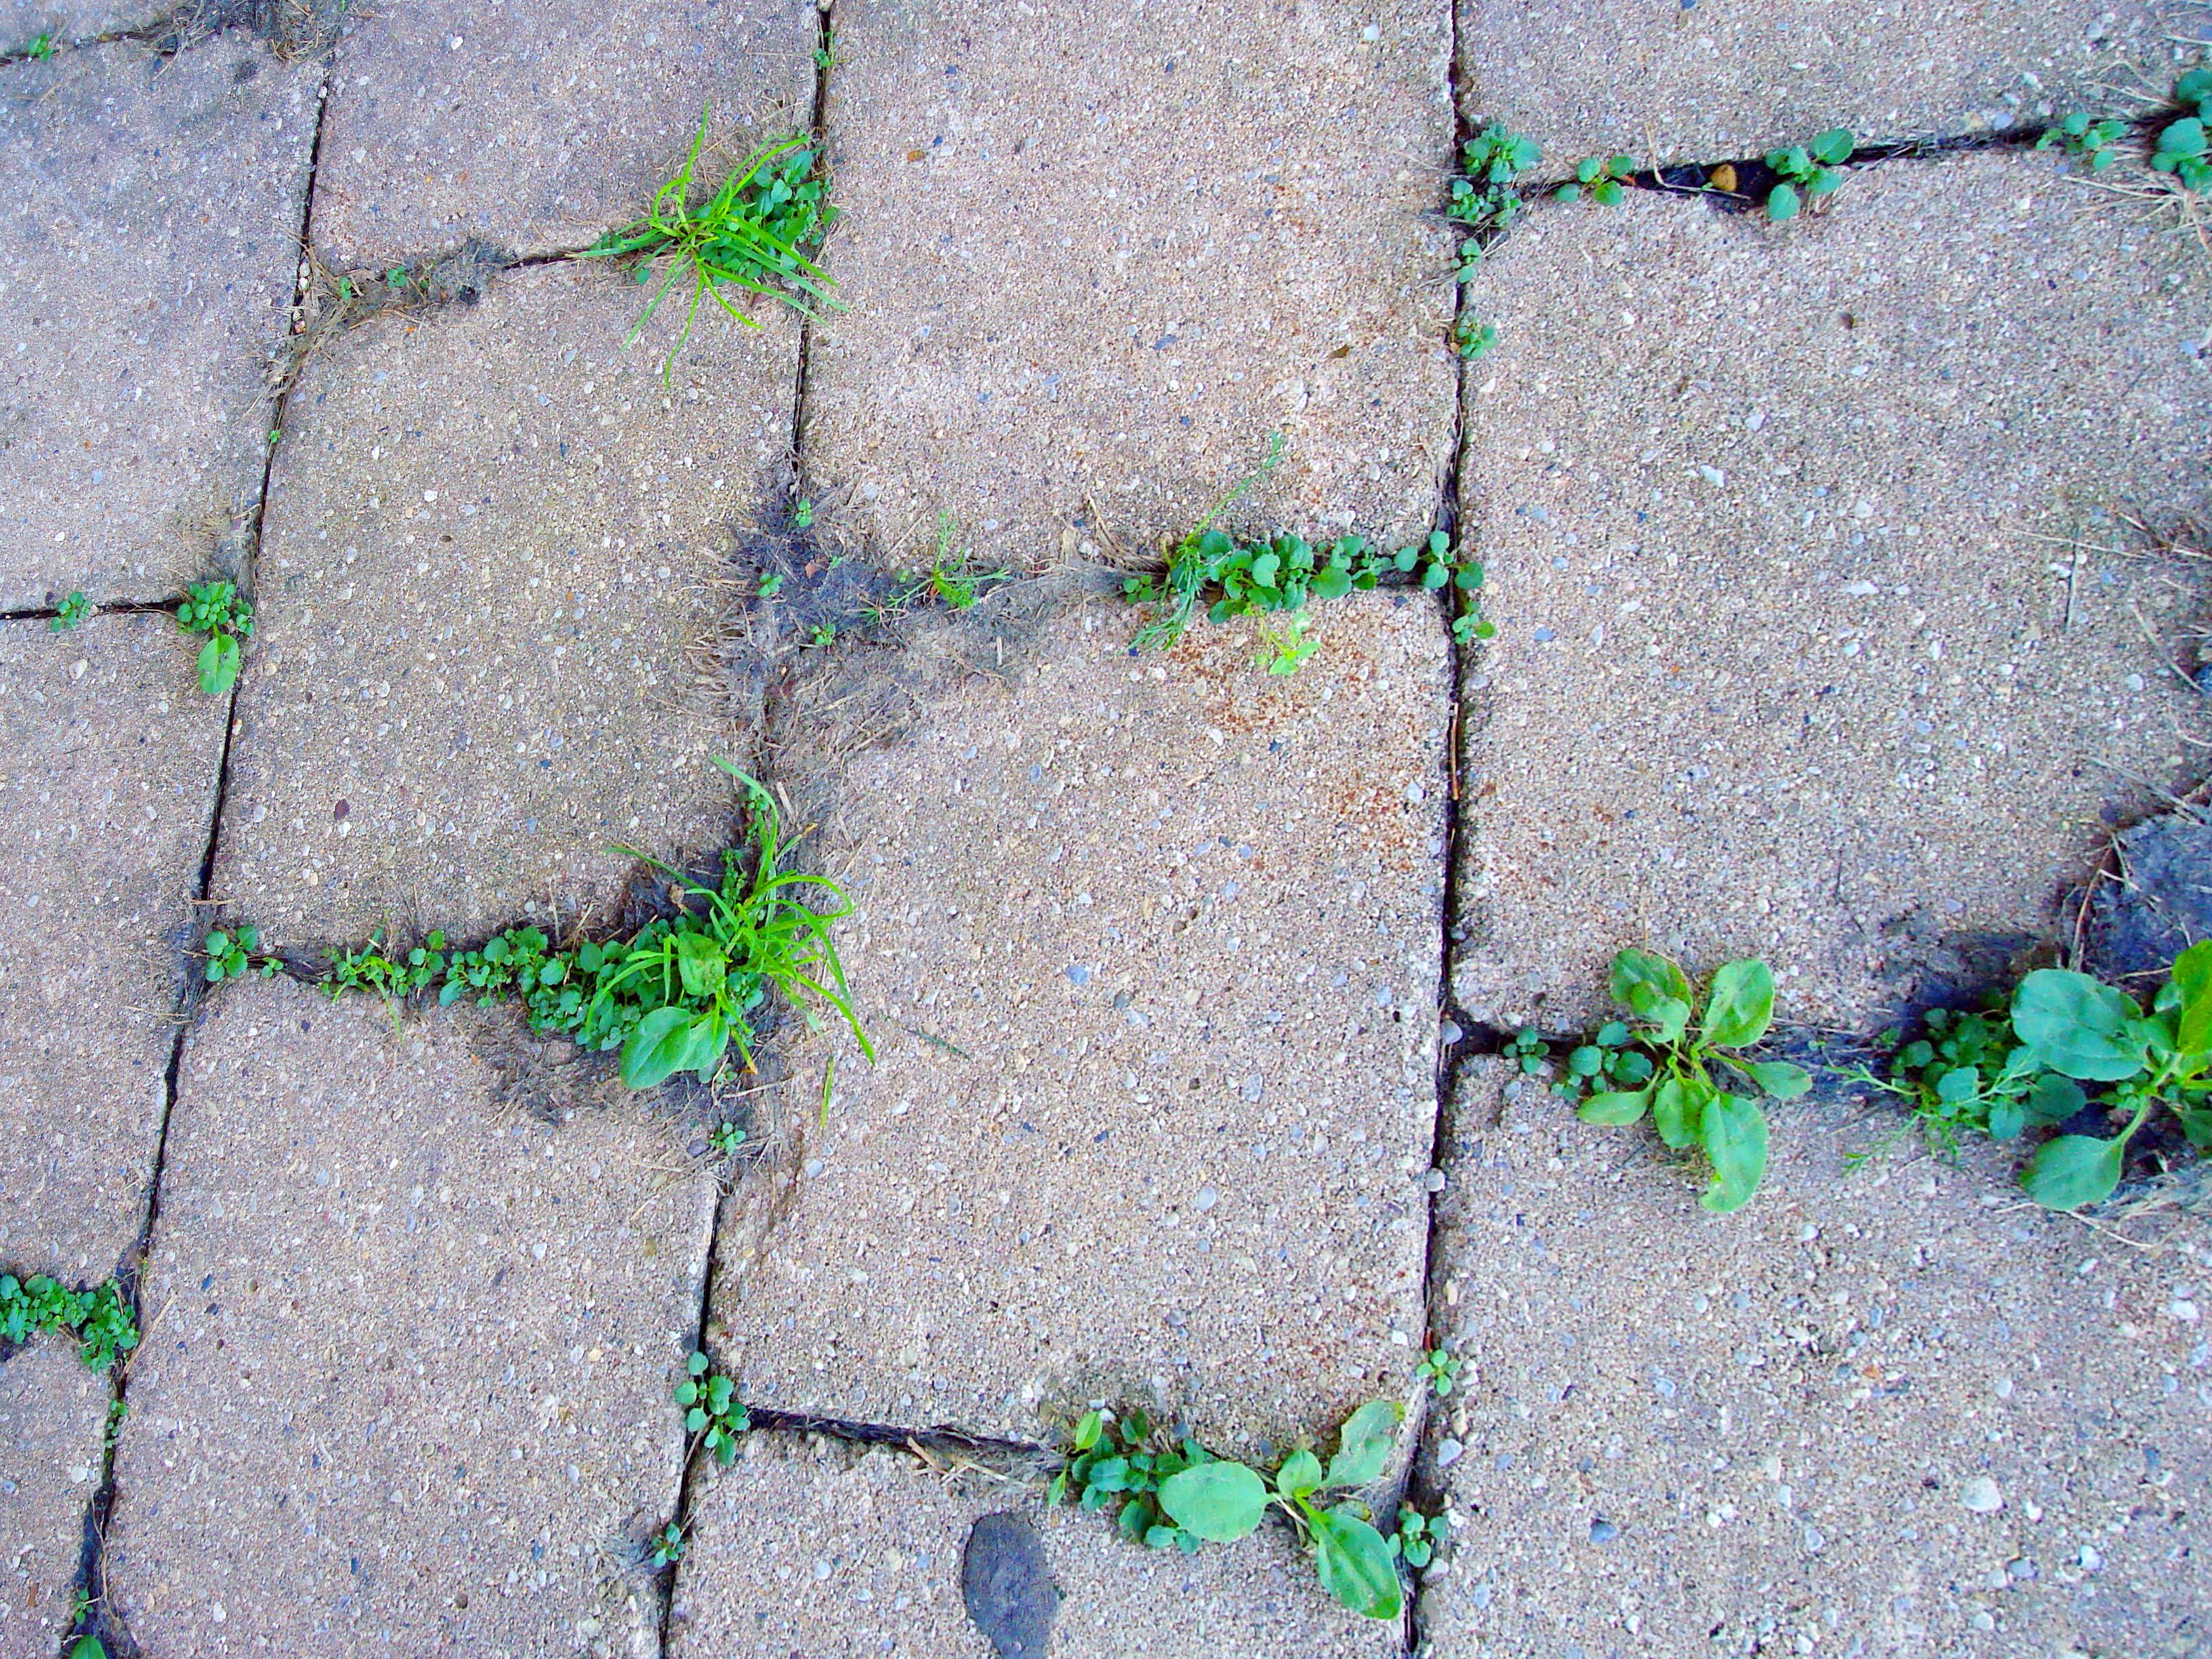 Weeds growing between pavers